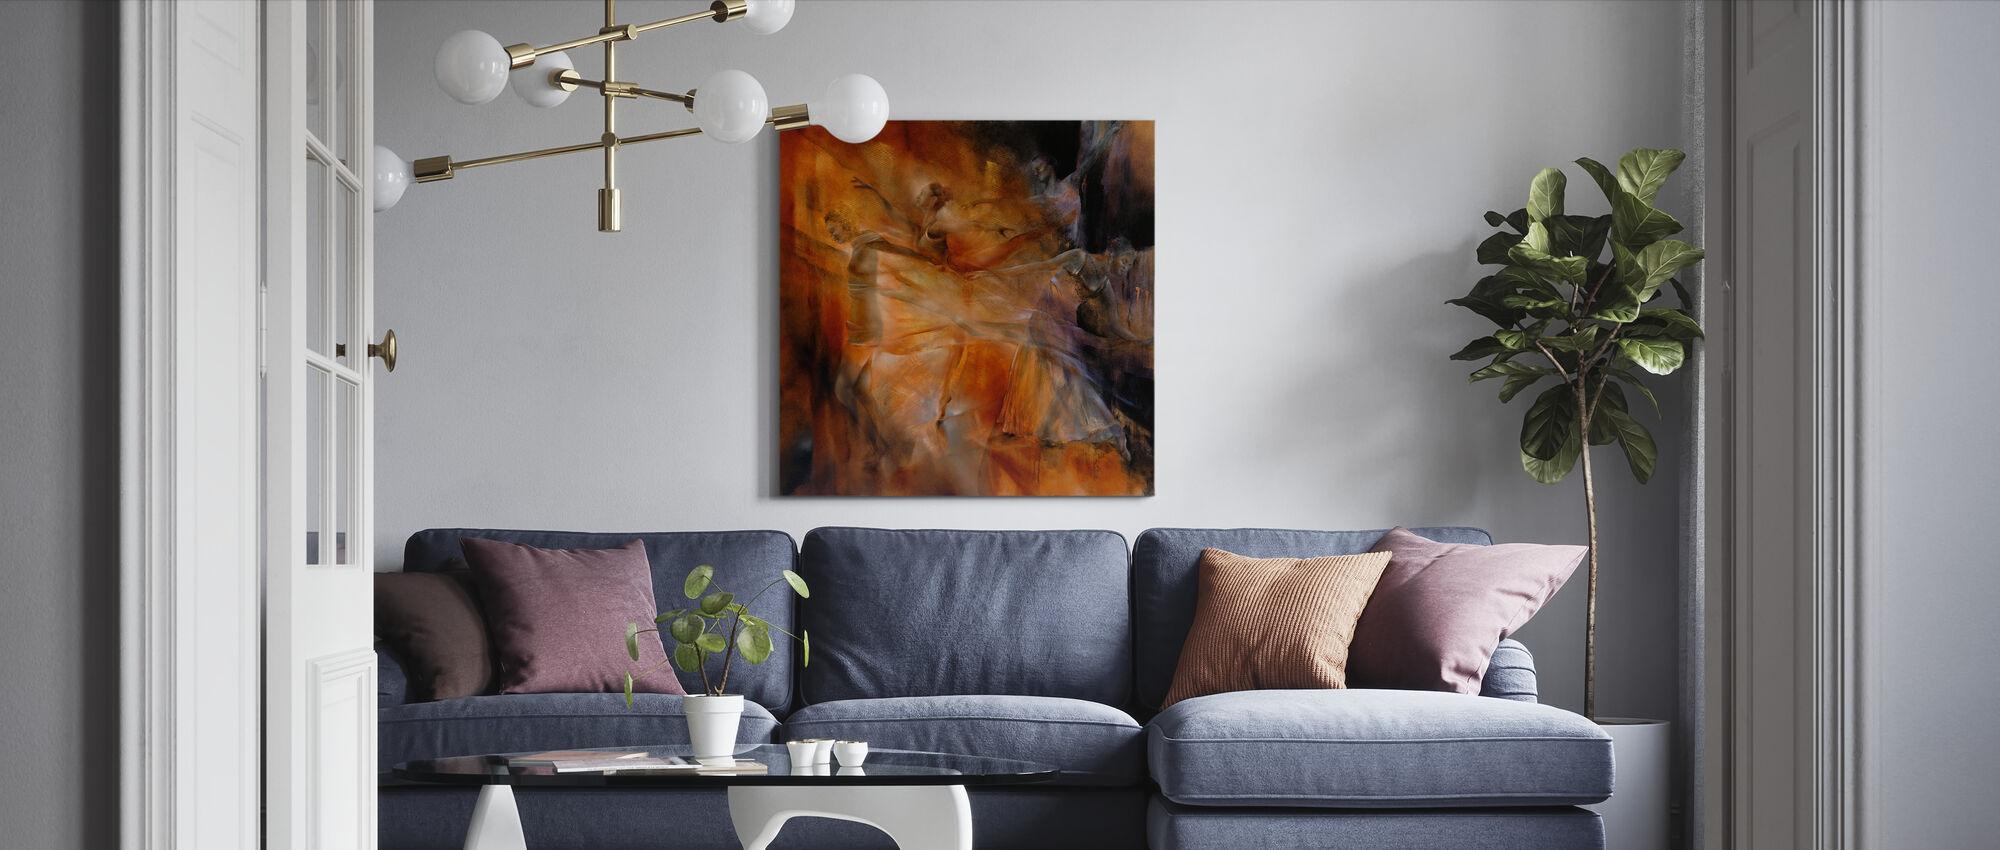 Balance Four Dancers - Canvas print - Living Room